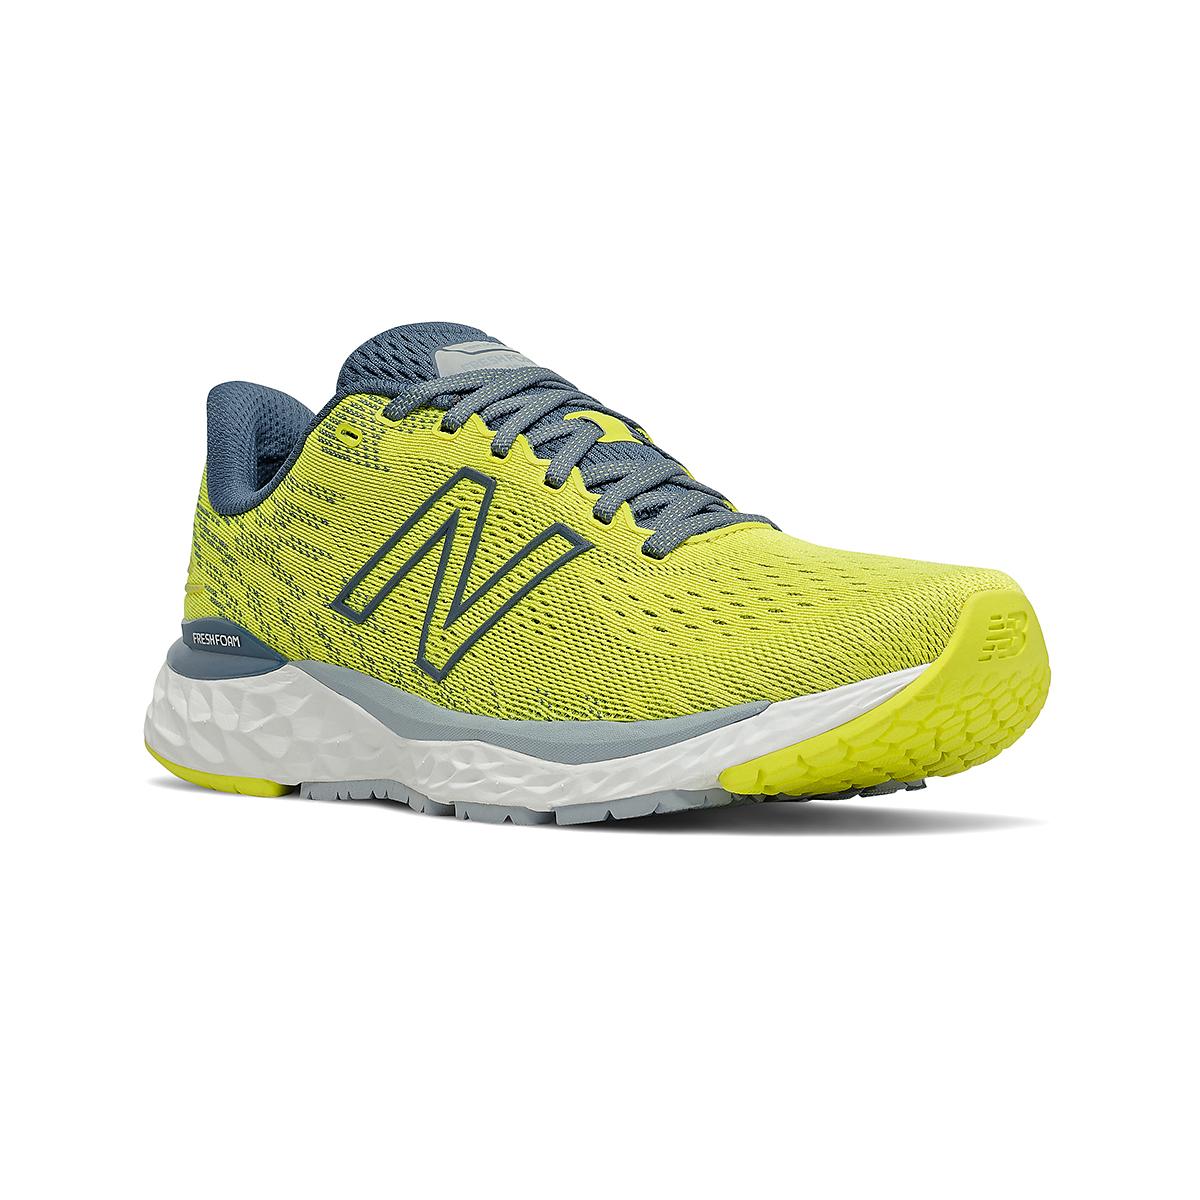 Men's New Balance Fresh Foam 880v11 Running Shoe - Color: Sulphur Yellow/Deep Ocean Grey - Size: 7 - Width: Wide, Sulphur Yellow/Deep Ocean Grey, large, image 3